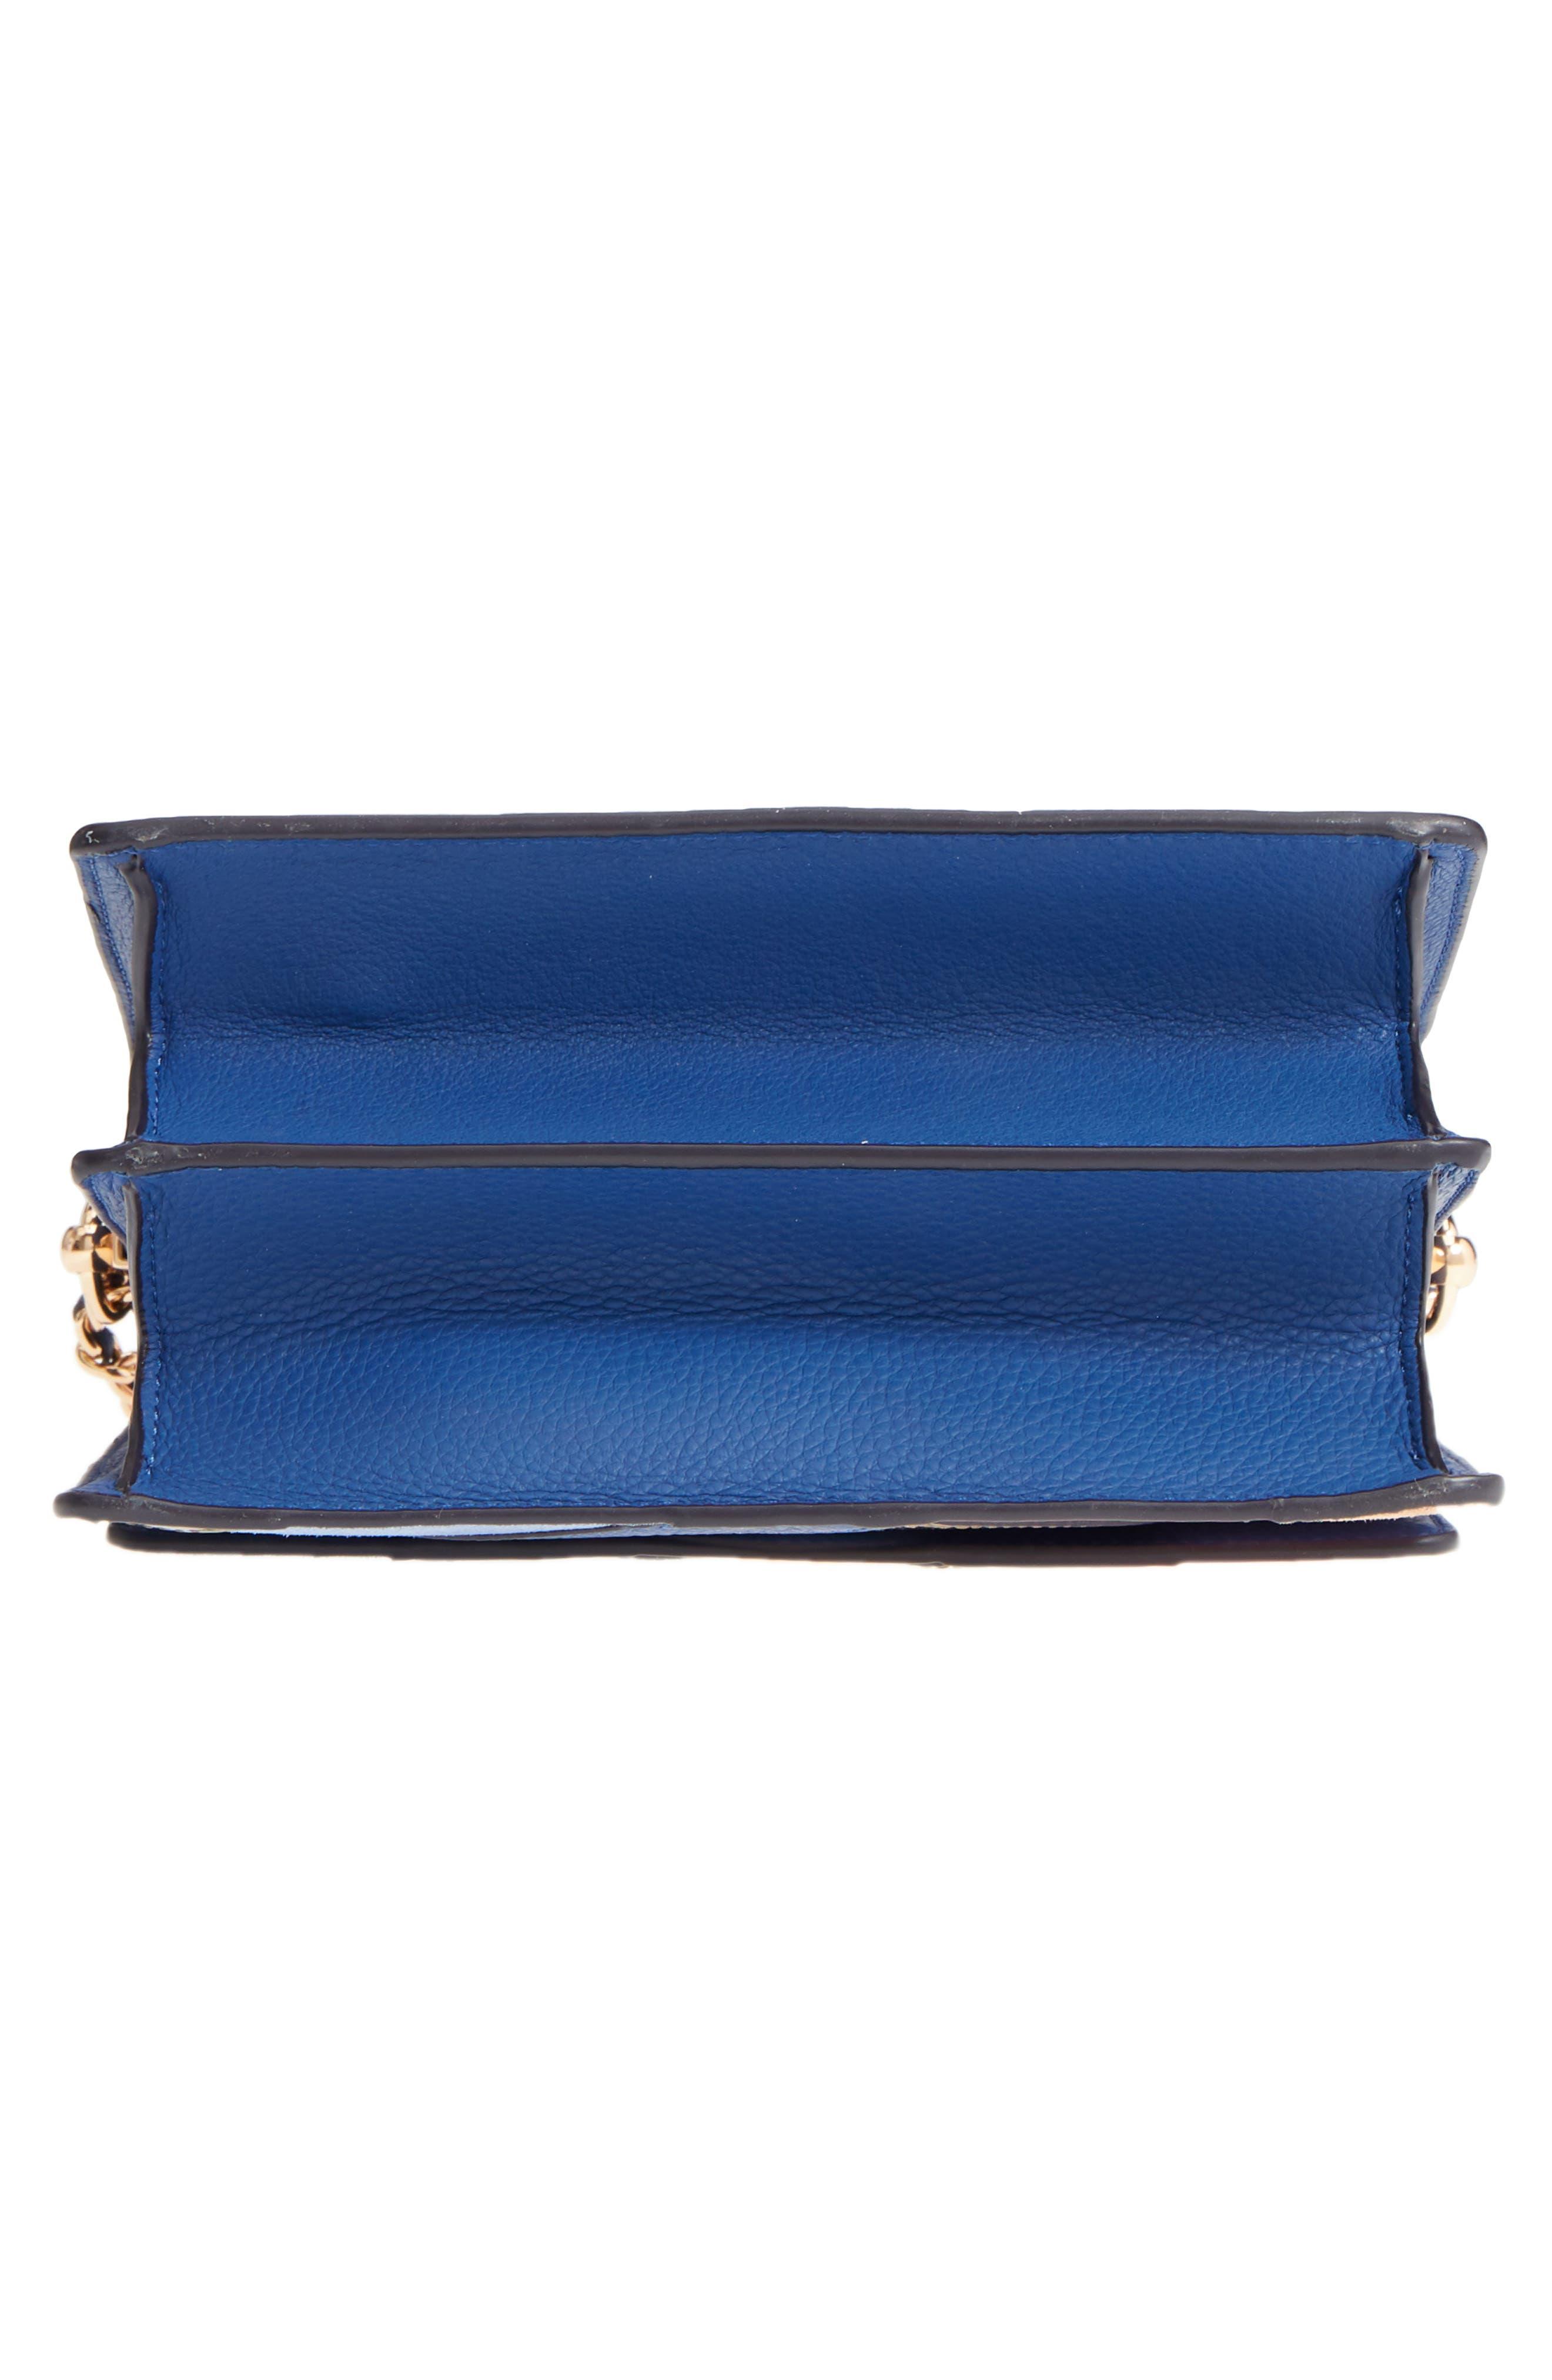 Robinson Pieced Shoulder Bag,                             Alternate thumbnail 6, color,                             Navy Multi